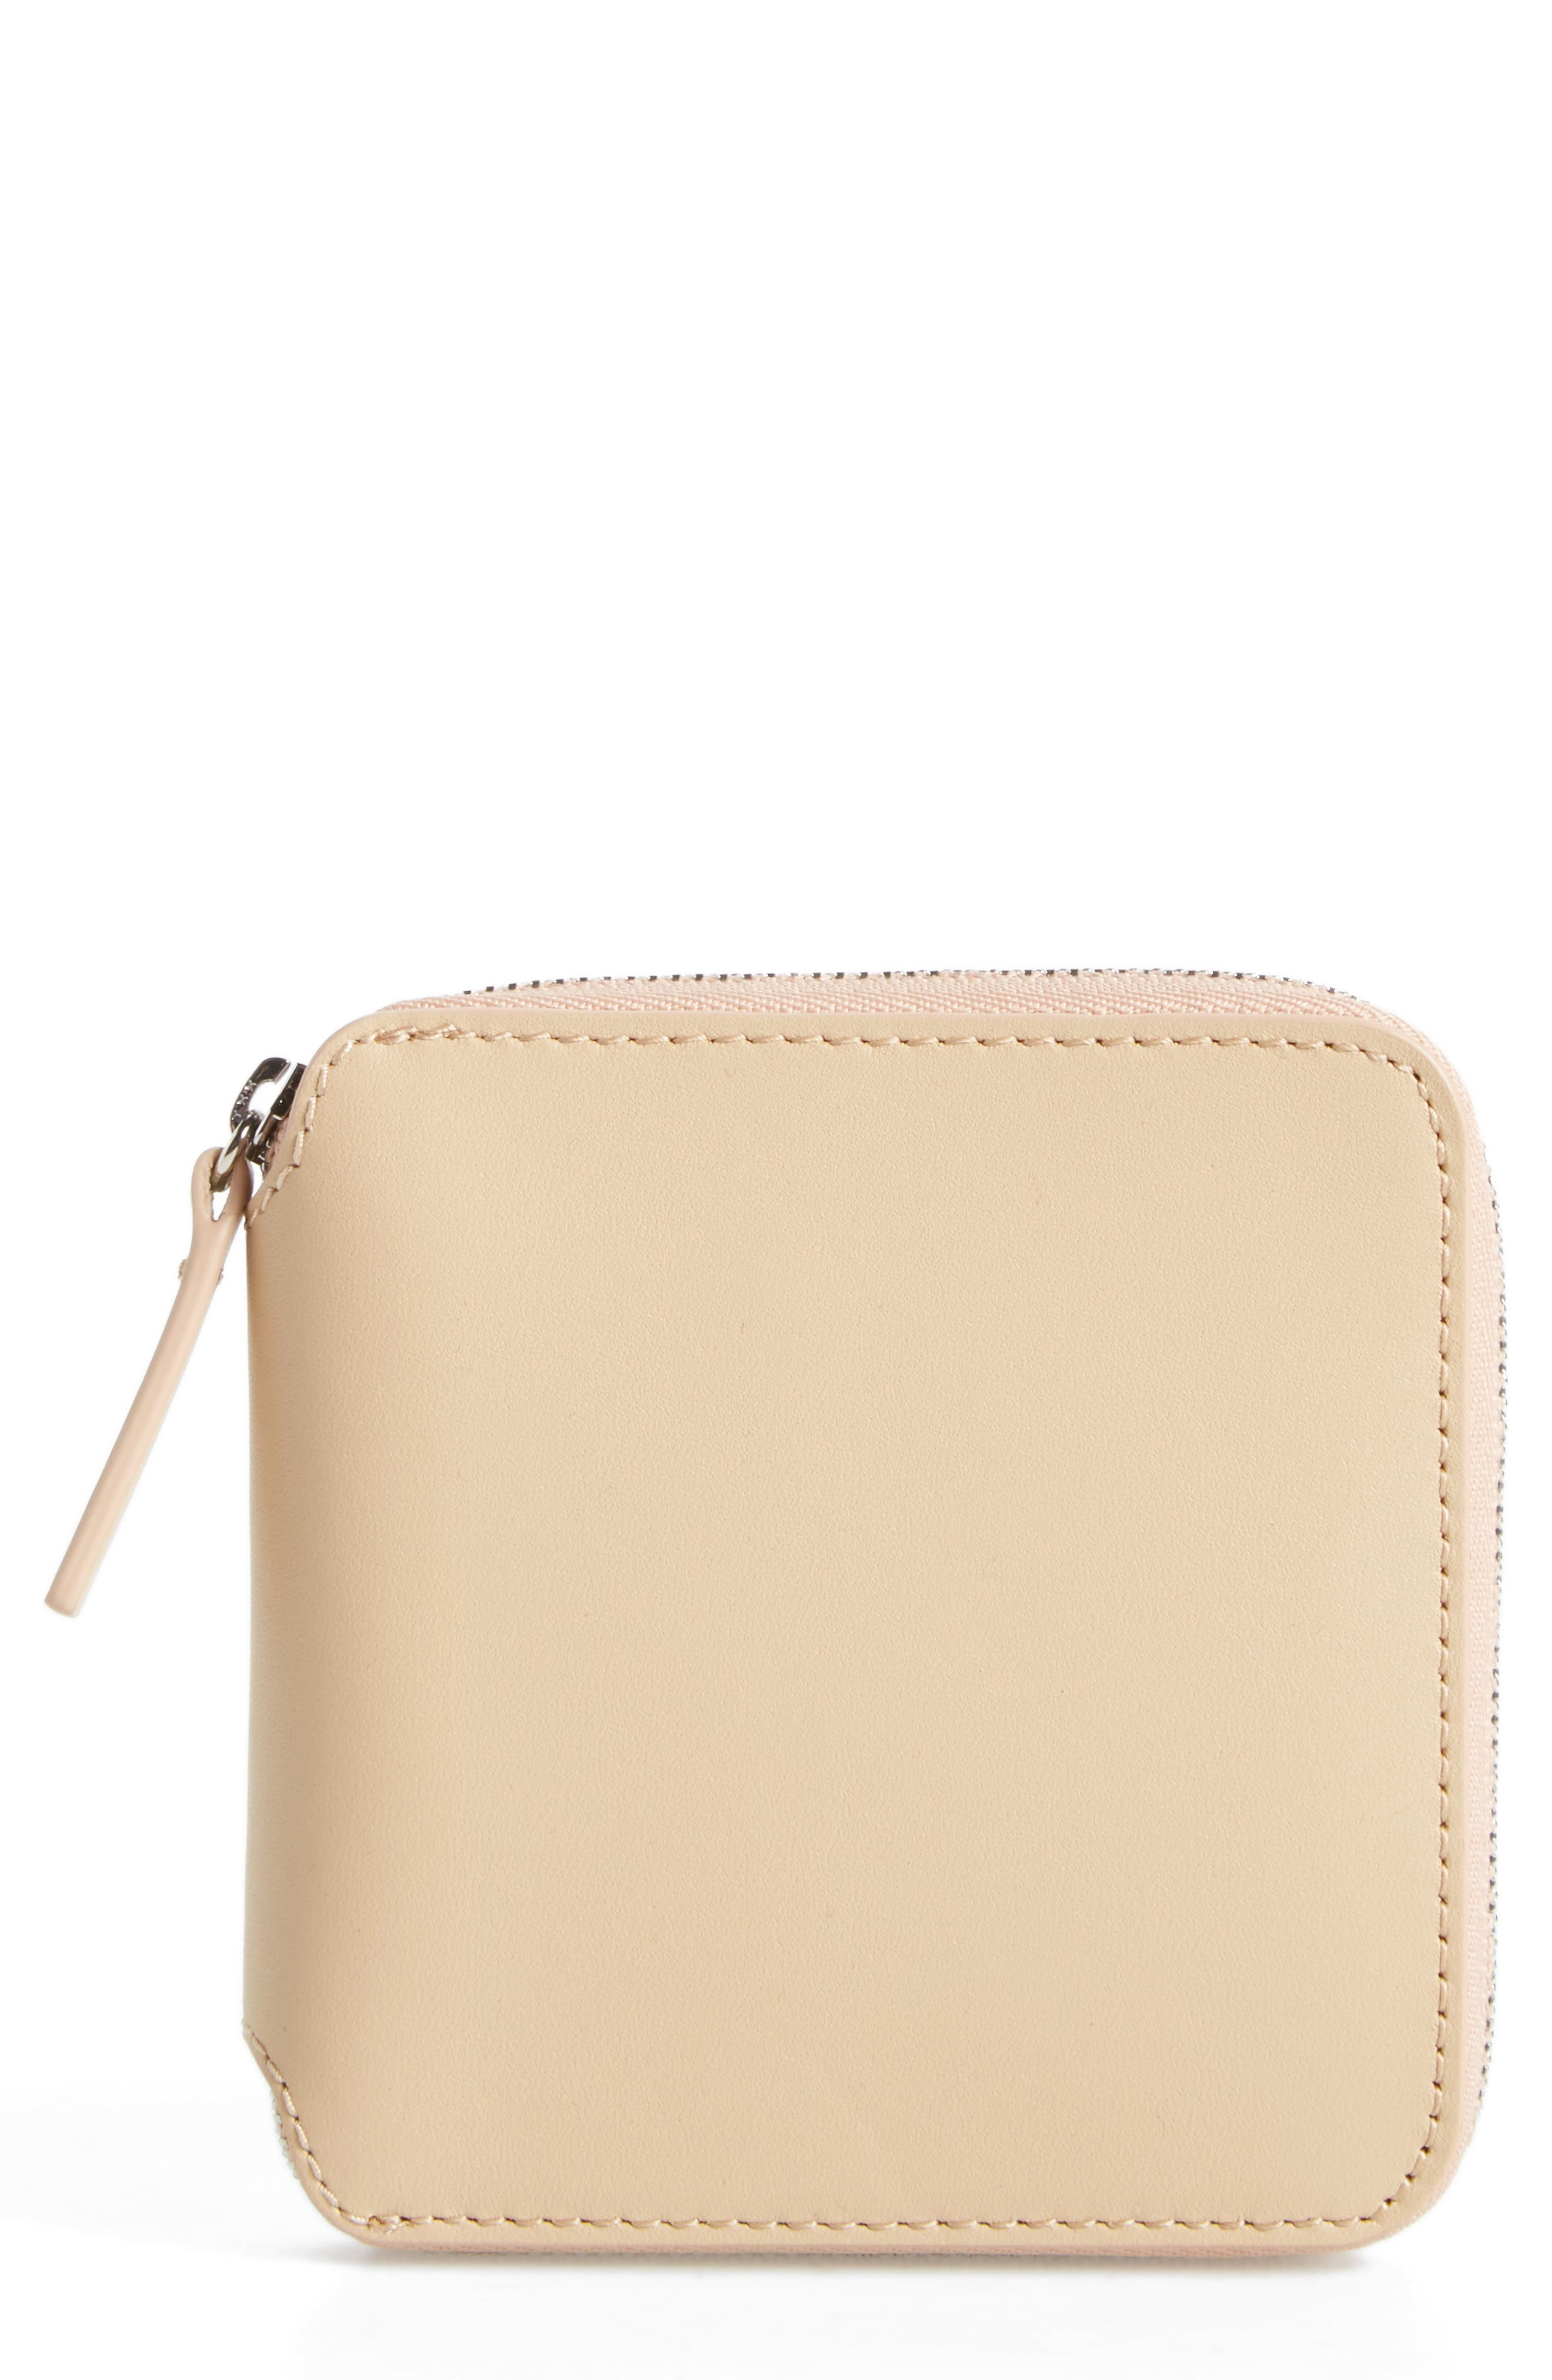 Baggu Zip Around Square Leather Wallet